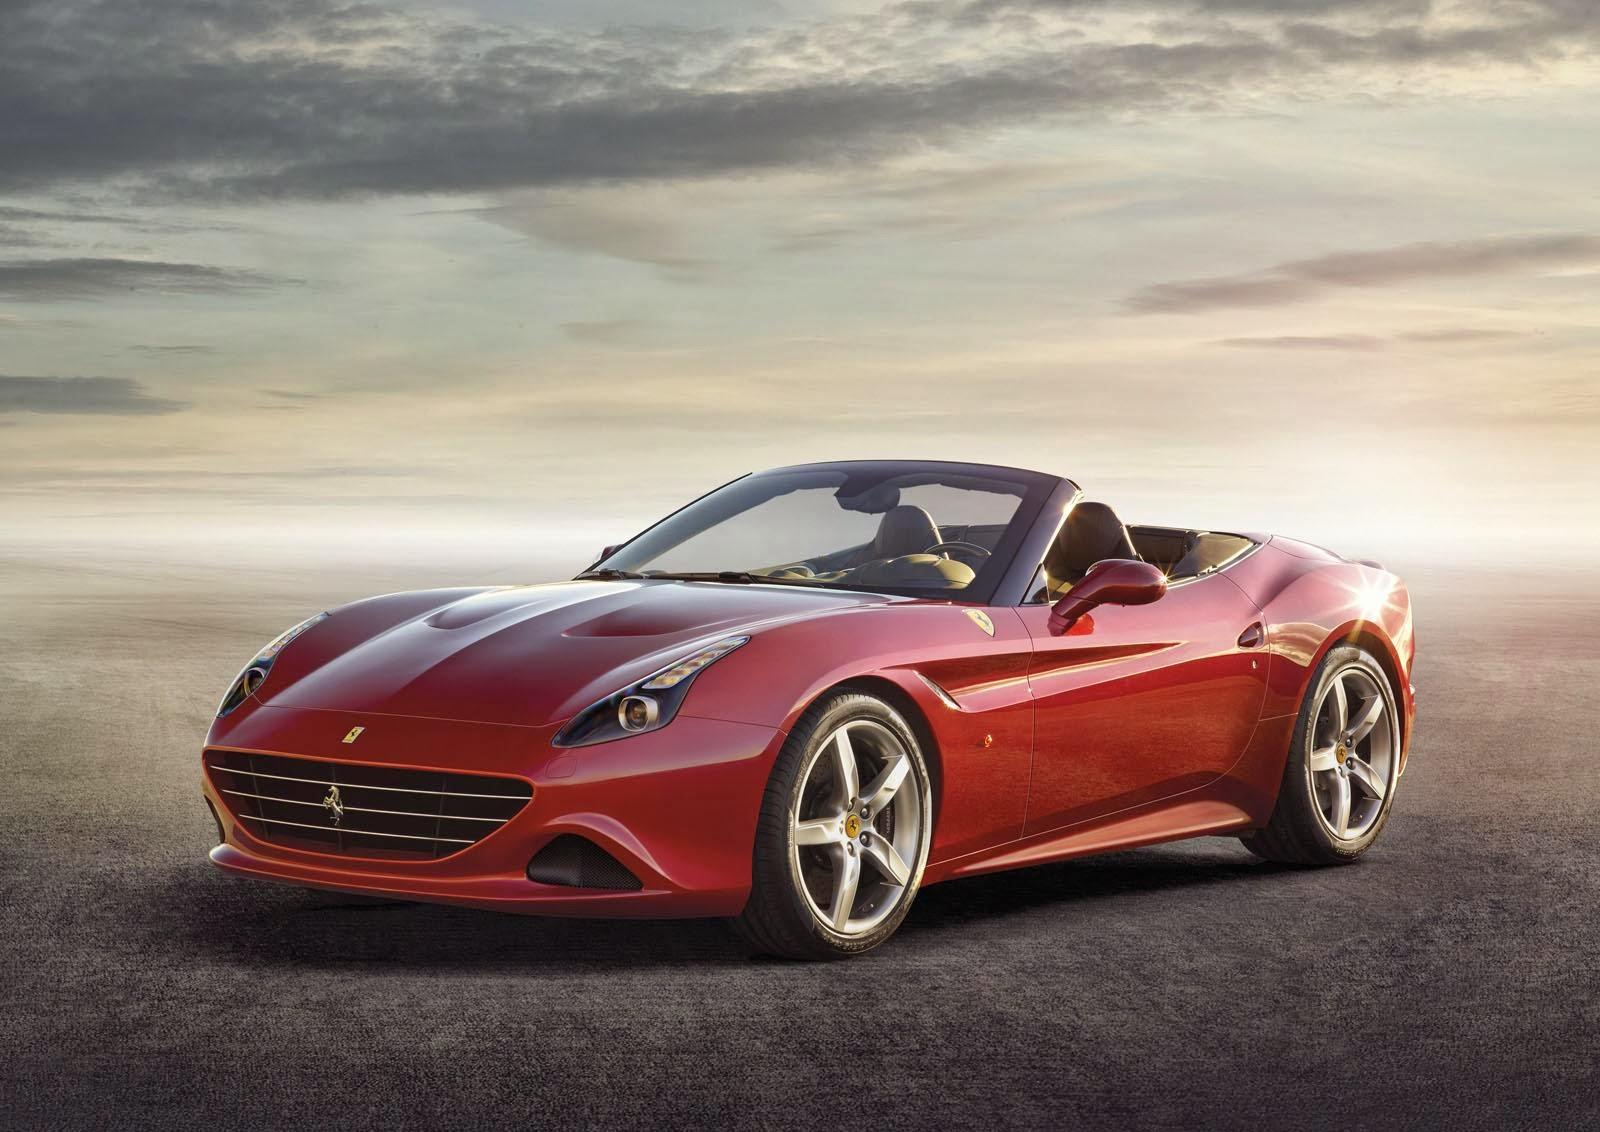 [Resim: Ferrari+California+T+1.jpg]